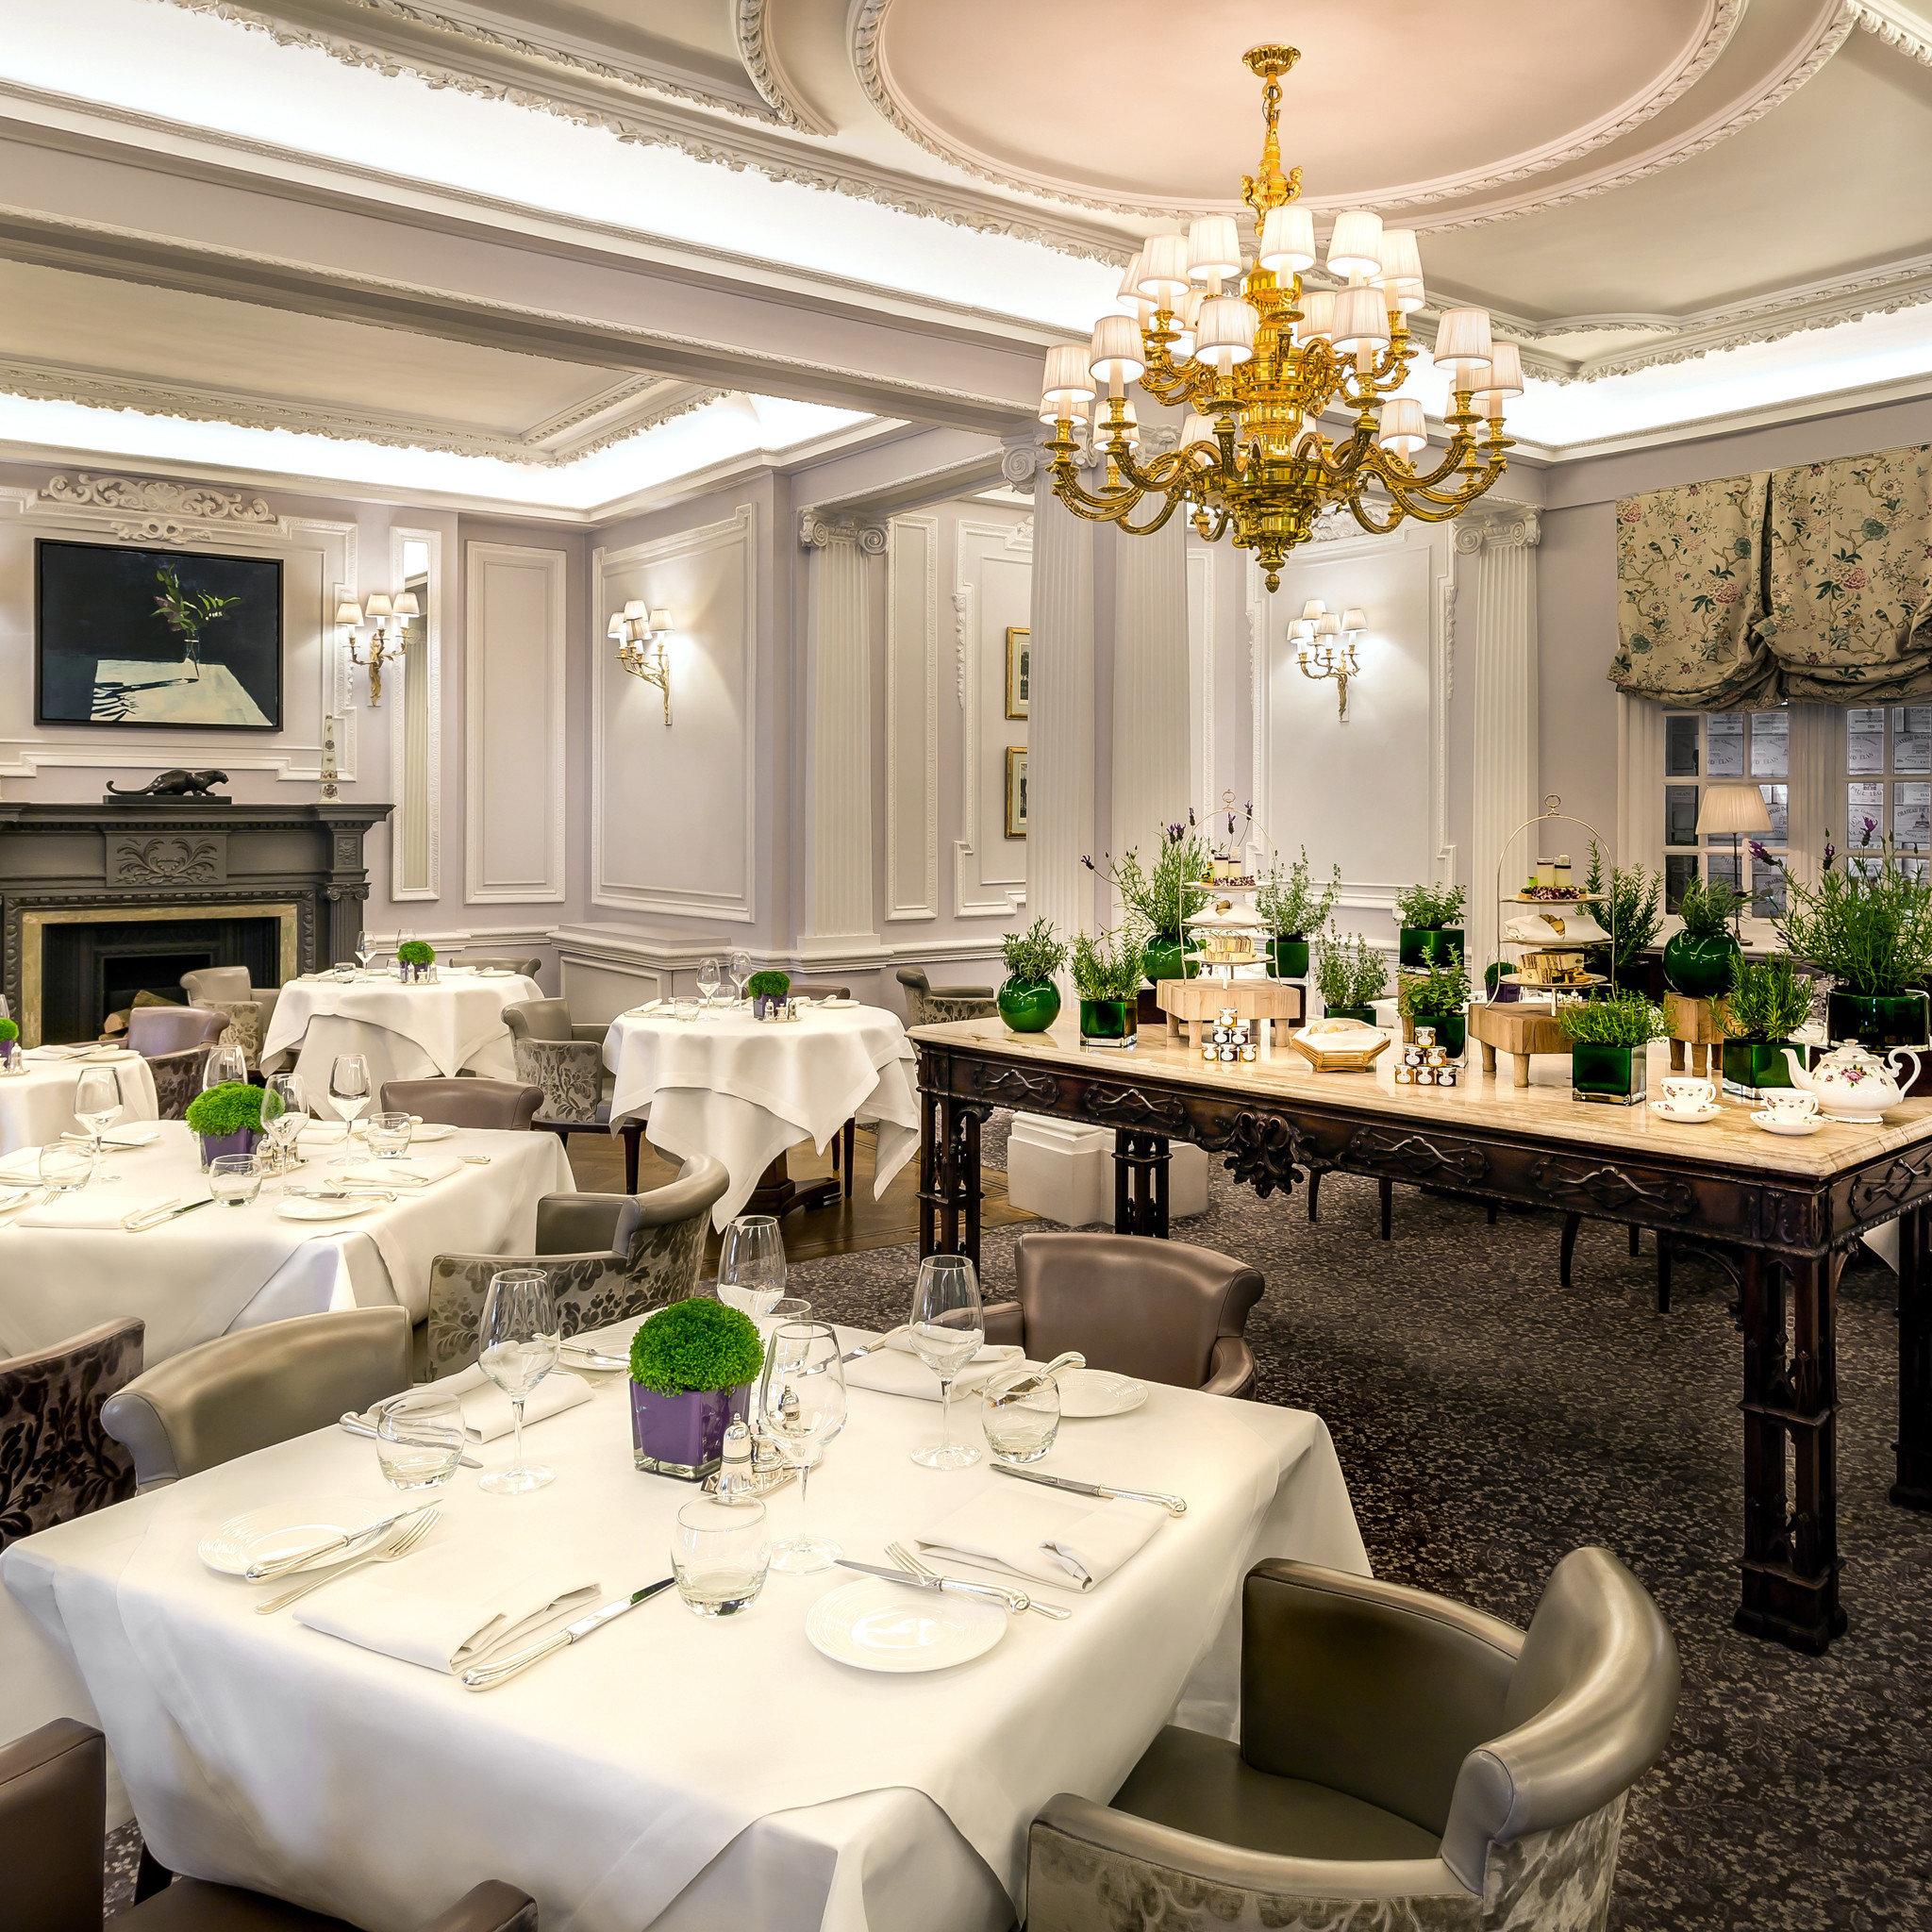 Dining Drink Eat Resort function hall banquet living room ballroom floristry mansion restaurant Suite centrepiece